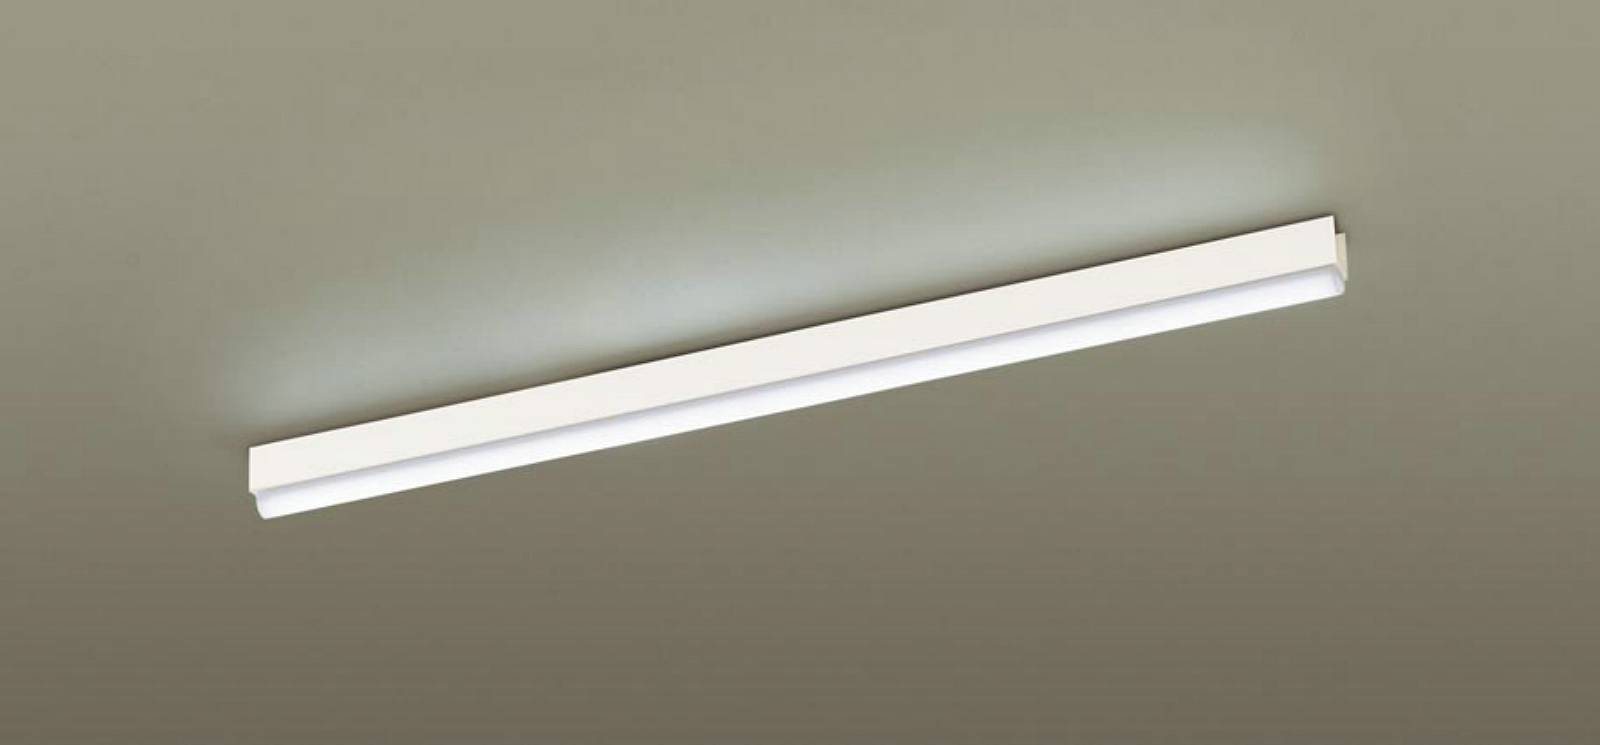 T区分 パナソニック LGB50606LB1 ベースライト 建築化照明器具 畳数設定無し LED【setsuden_led】